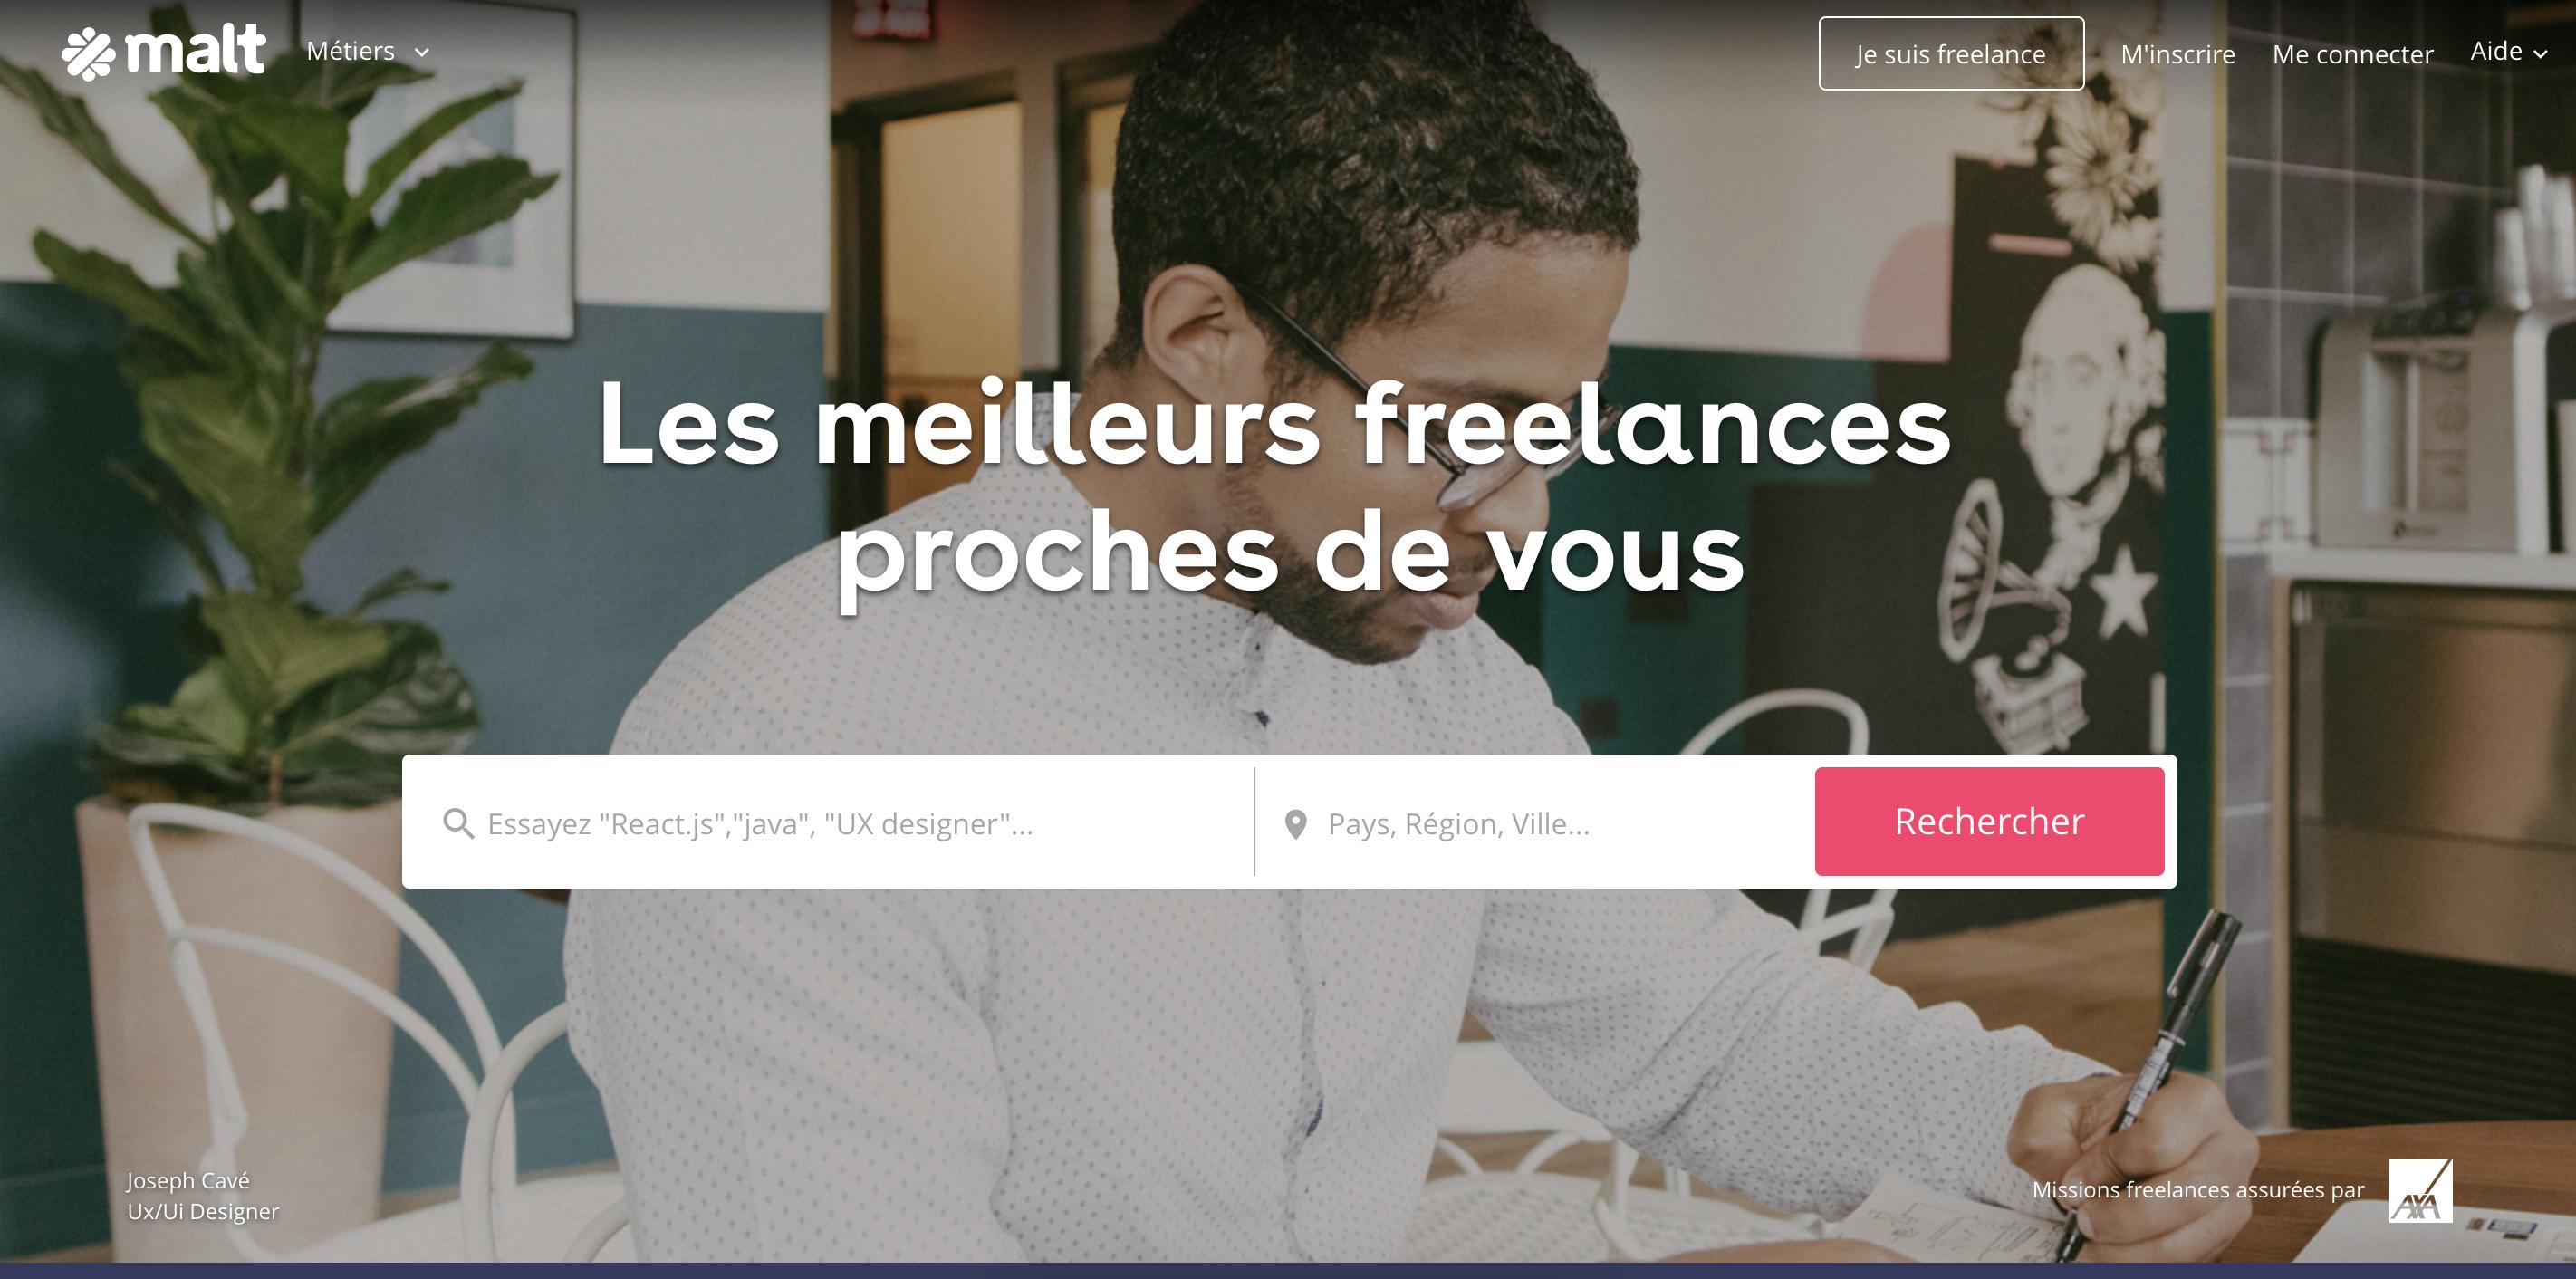 malt-plateforme-freelance